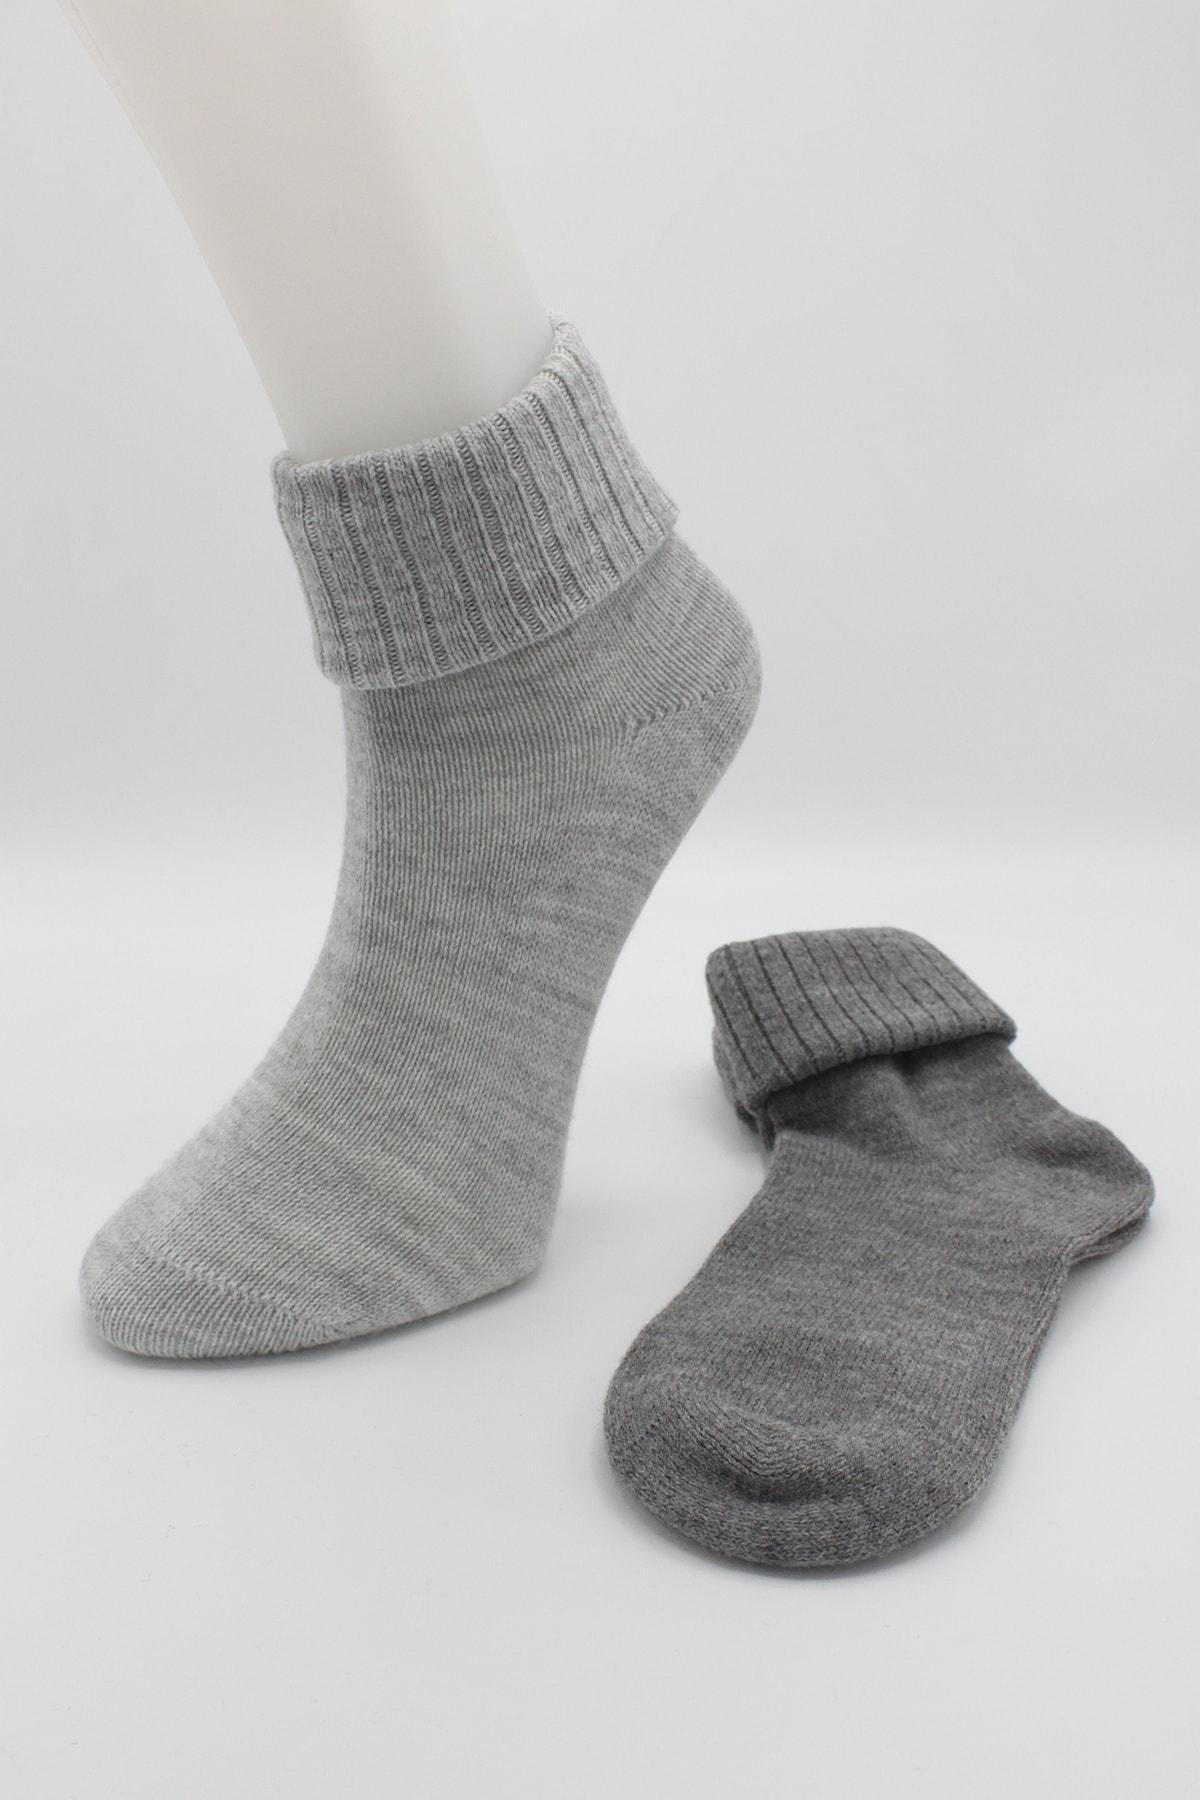 Igloo Socks Igloo 2'li Kıvrık Dikişsiz Yün Çorabı 2